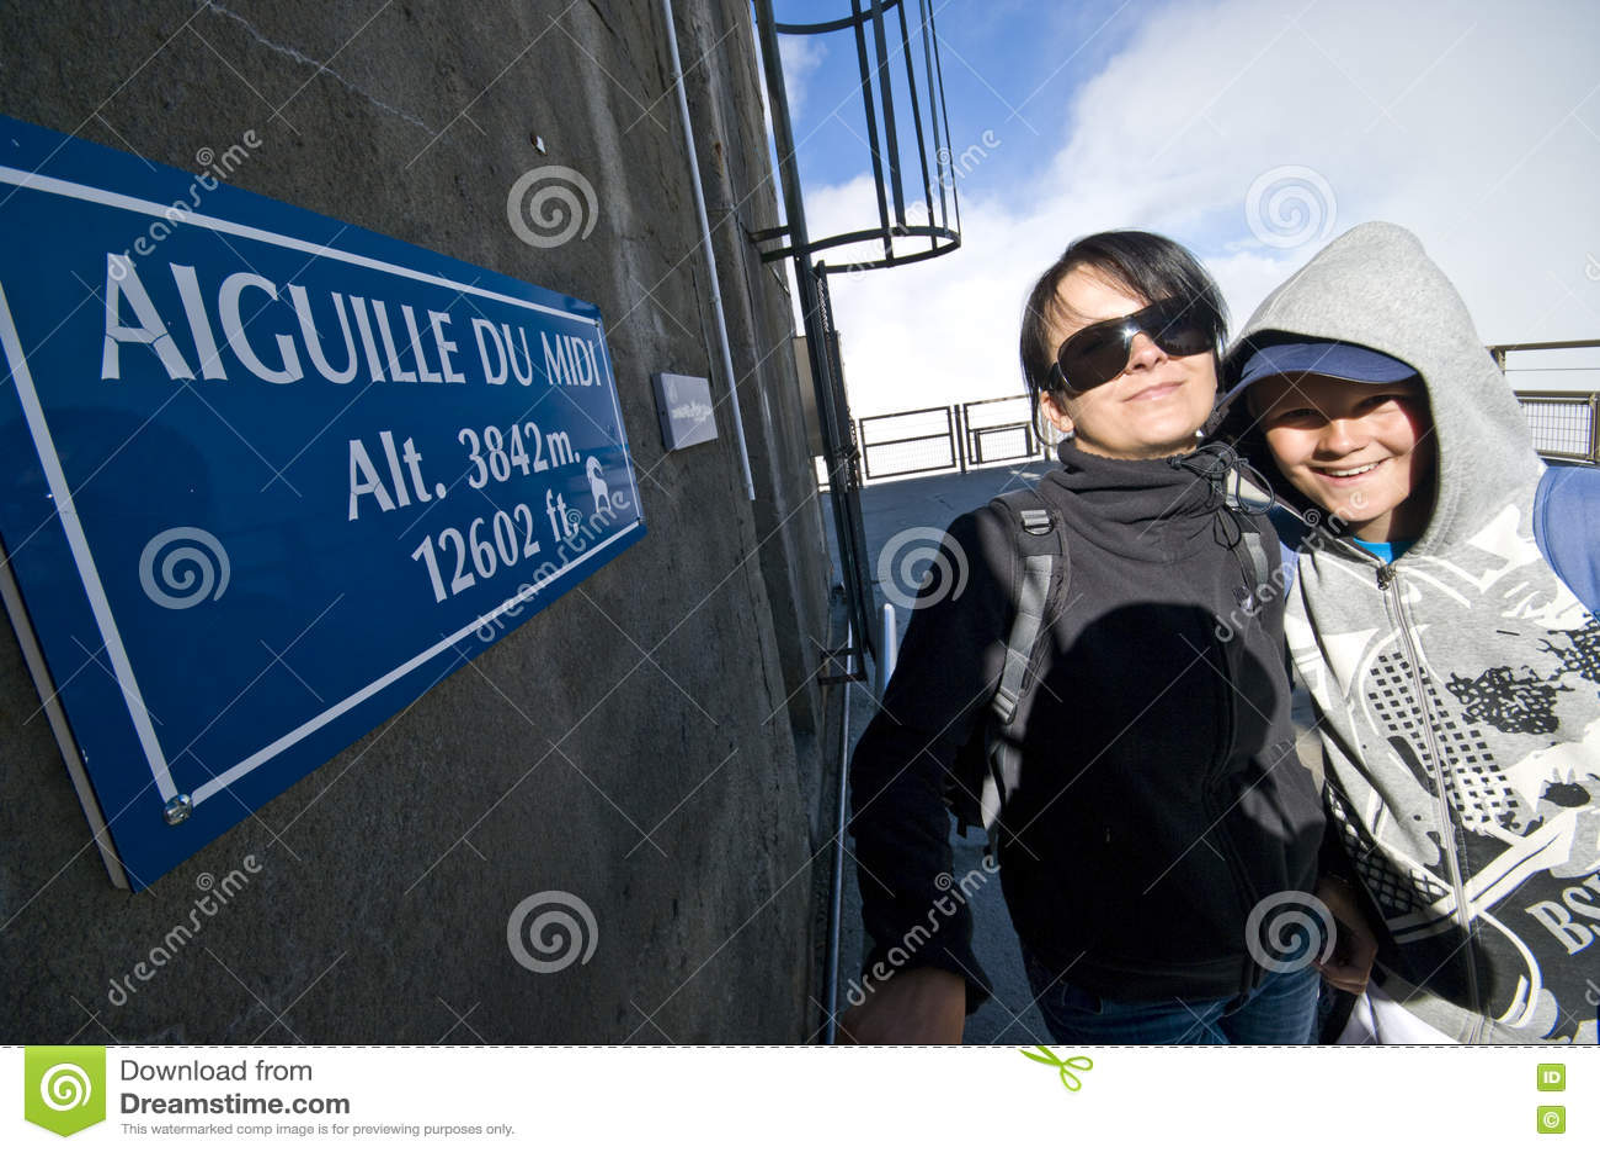 Turistas em Aiguille du Midi, França